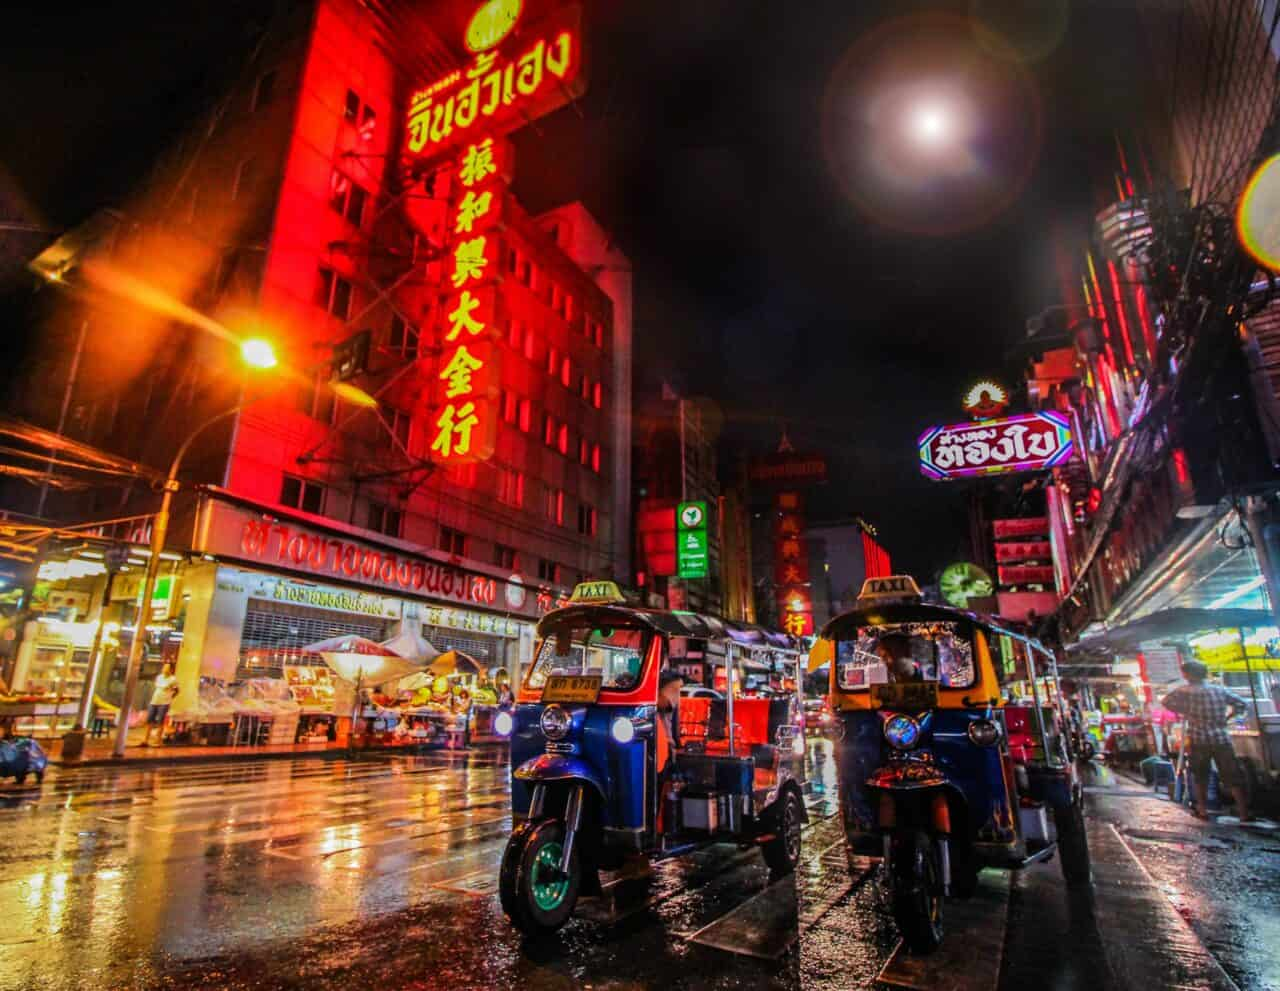 Tuk Tuk at night. If you are wondering where to stay in Bangkok, Sukhumvit Road is a good choice